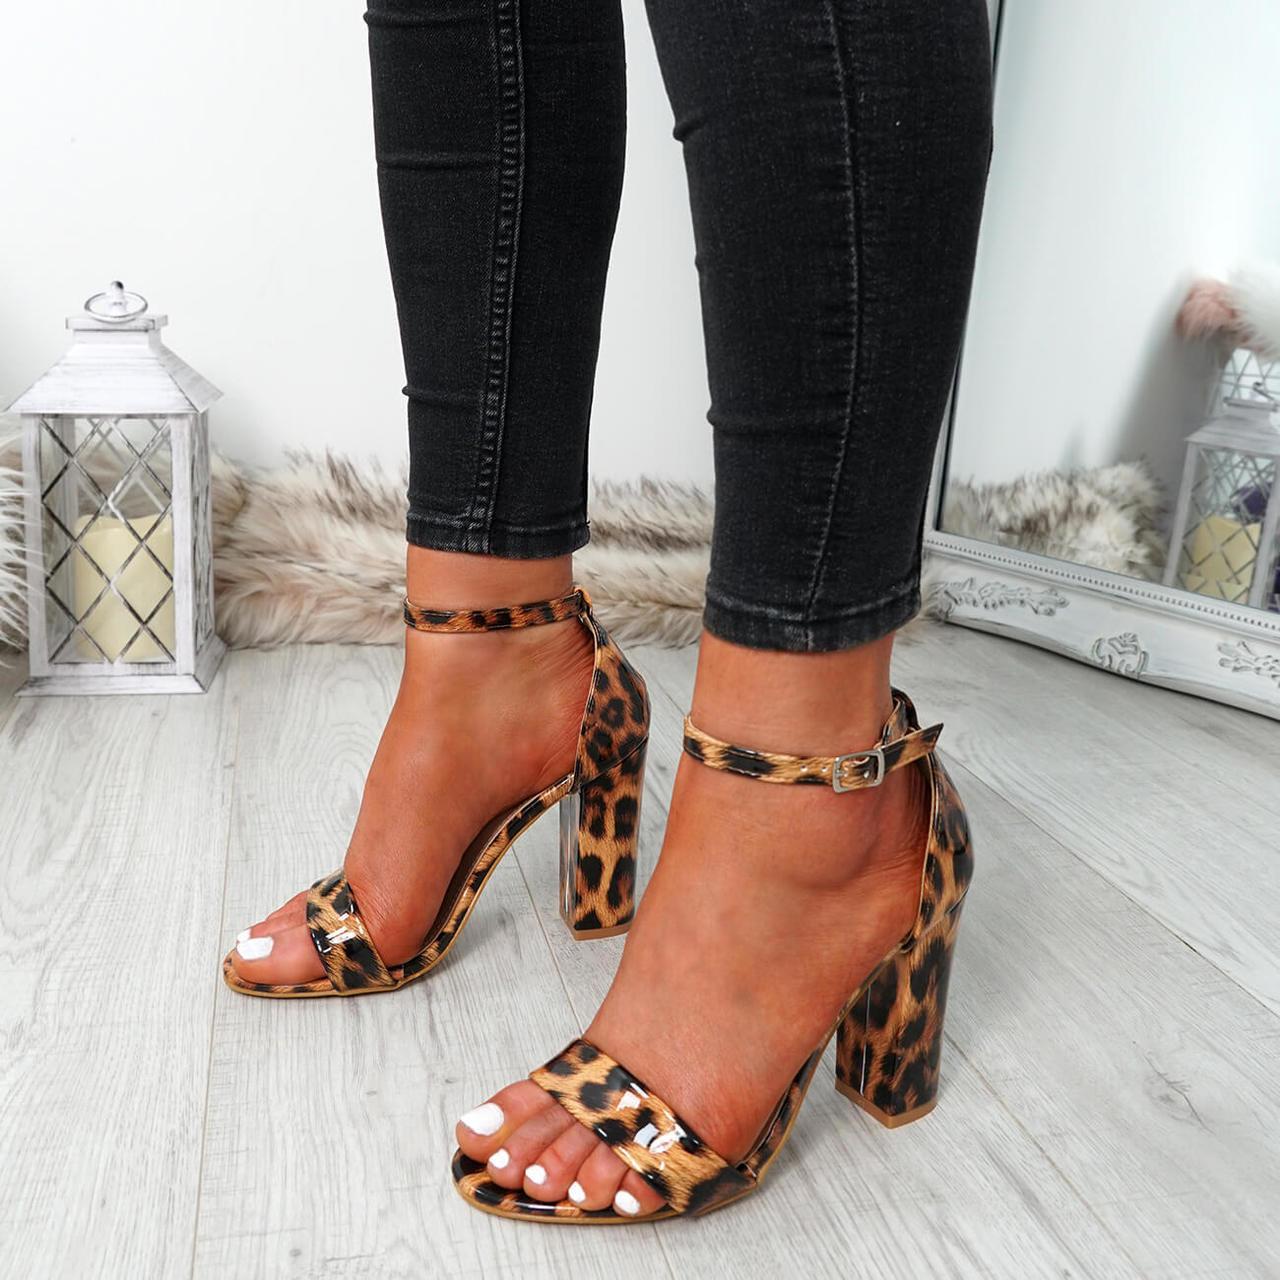 Block Heel Sandals Peep Toe Party Shoes